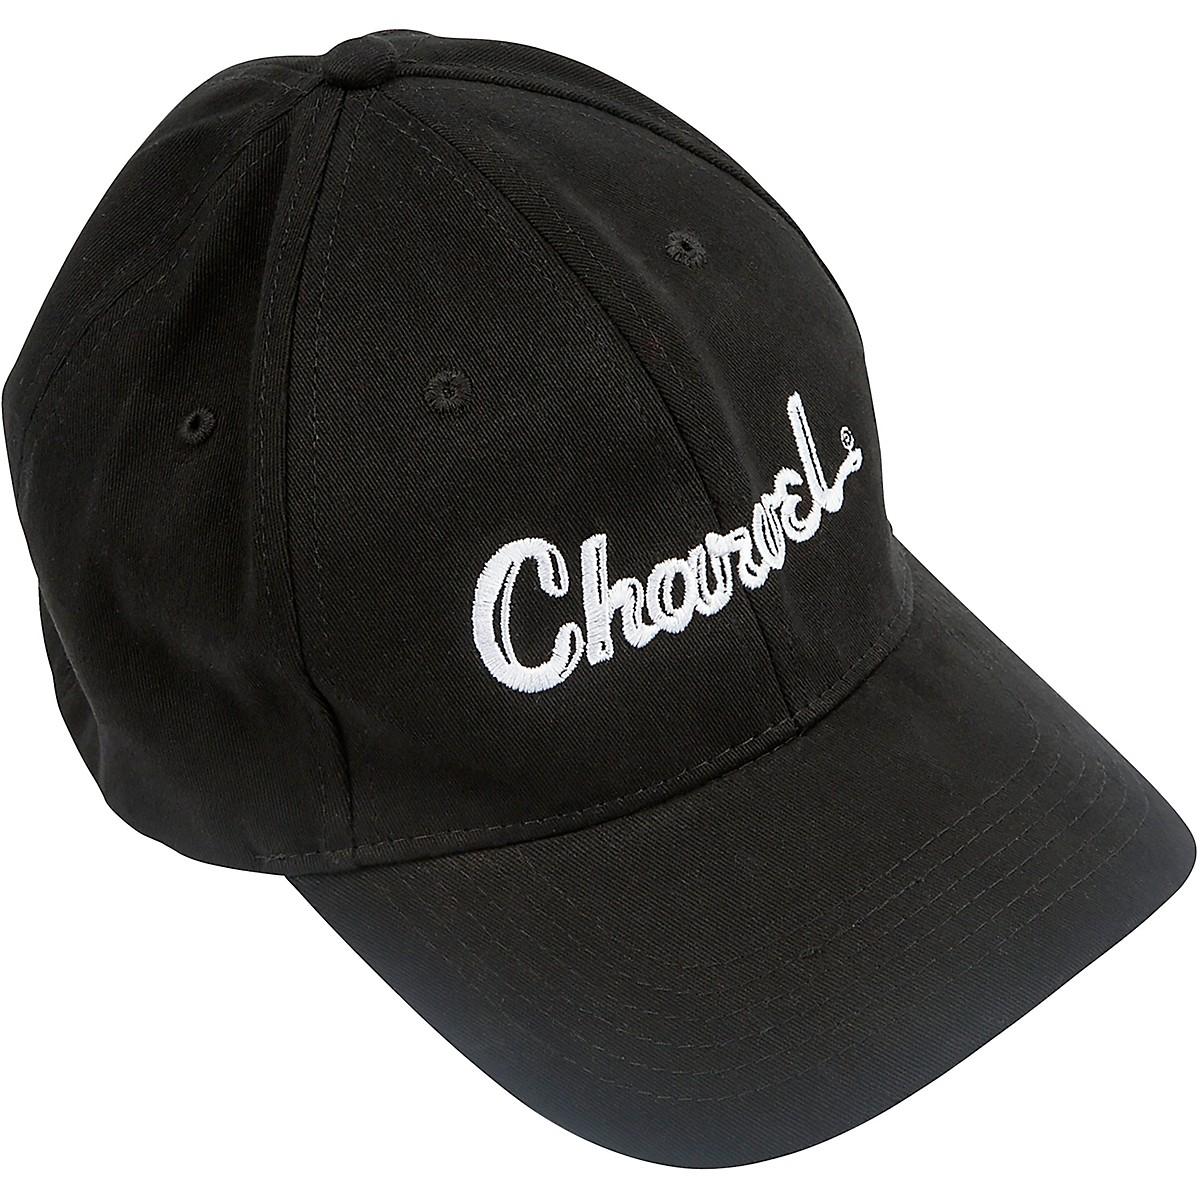 Charvel Toothpaste Logo Flexfit Hat - Black